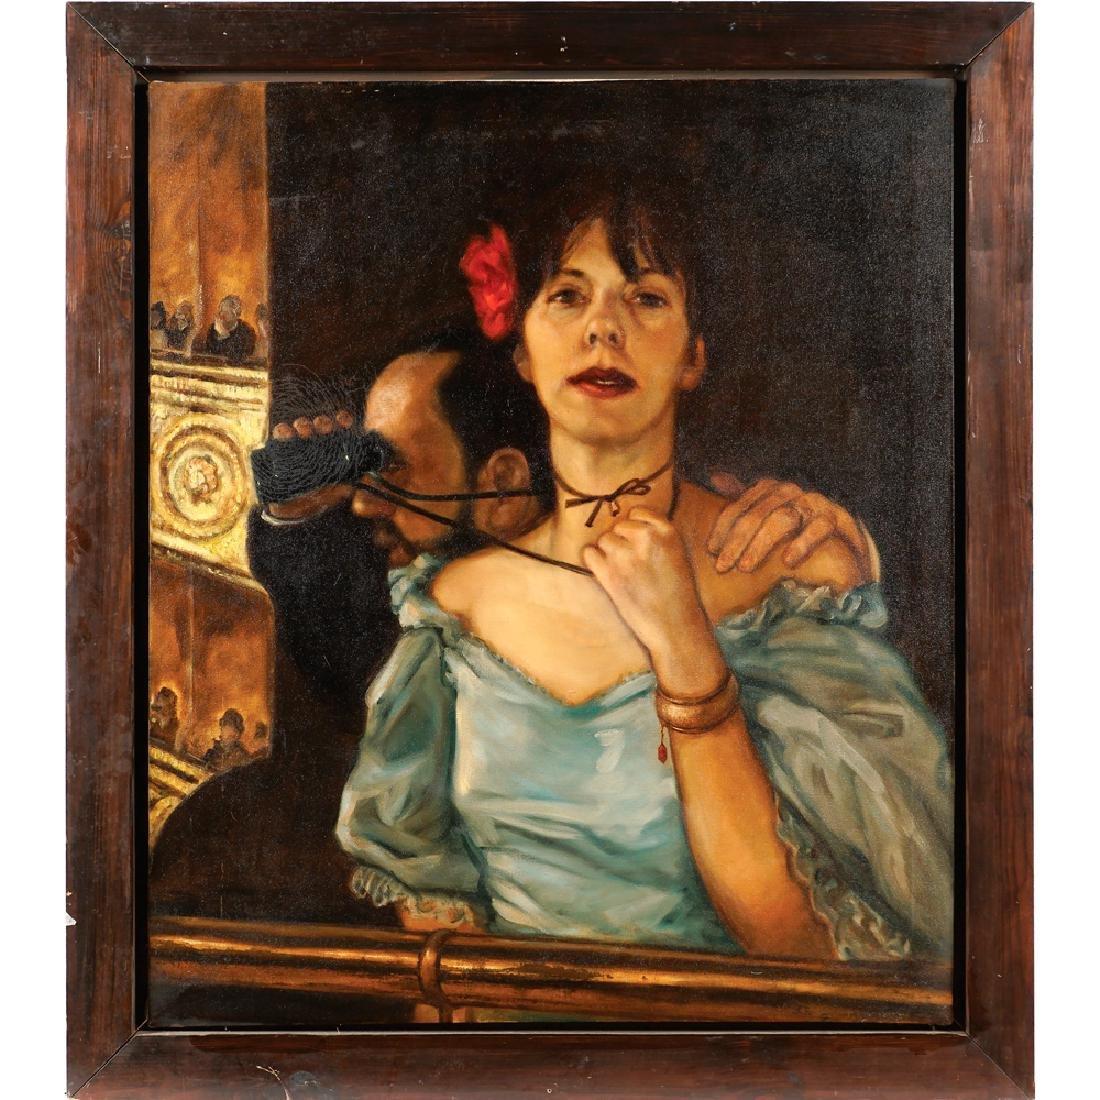 English painter early 20th century 100x85 cm.